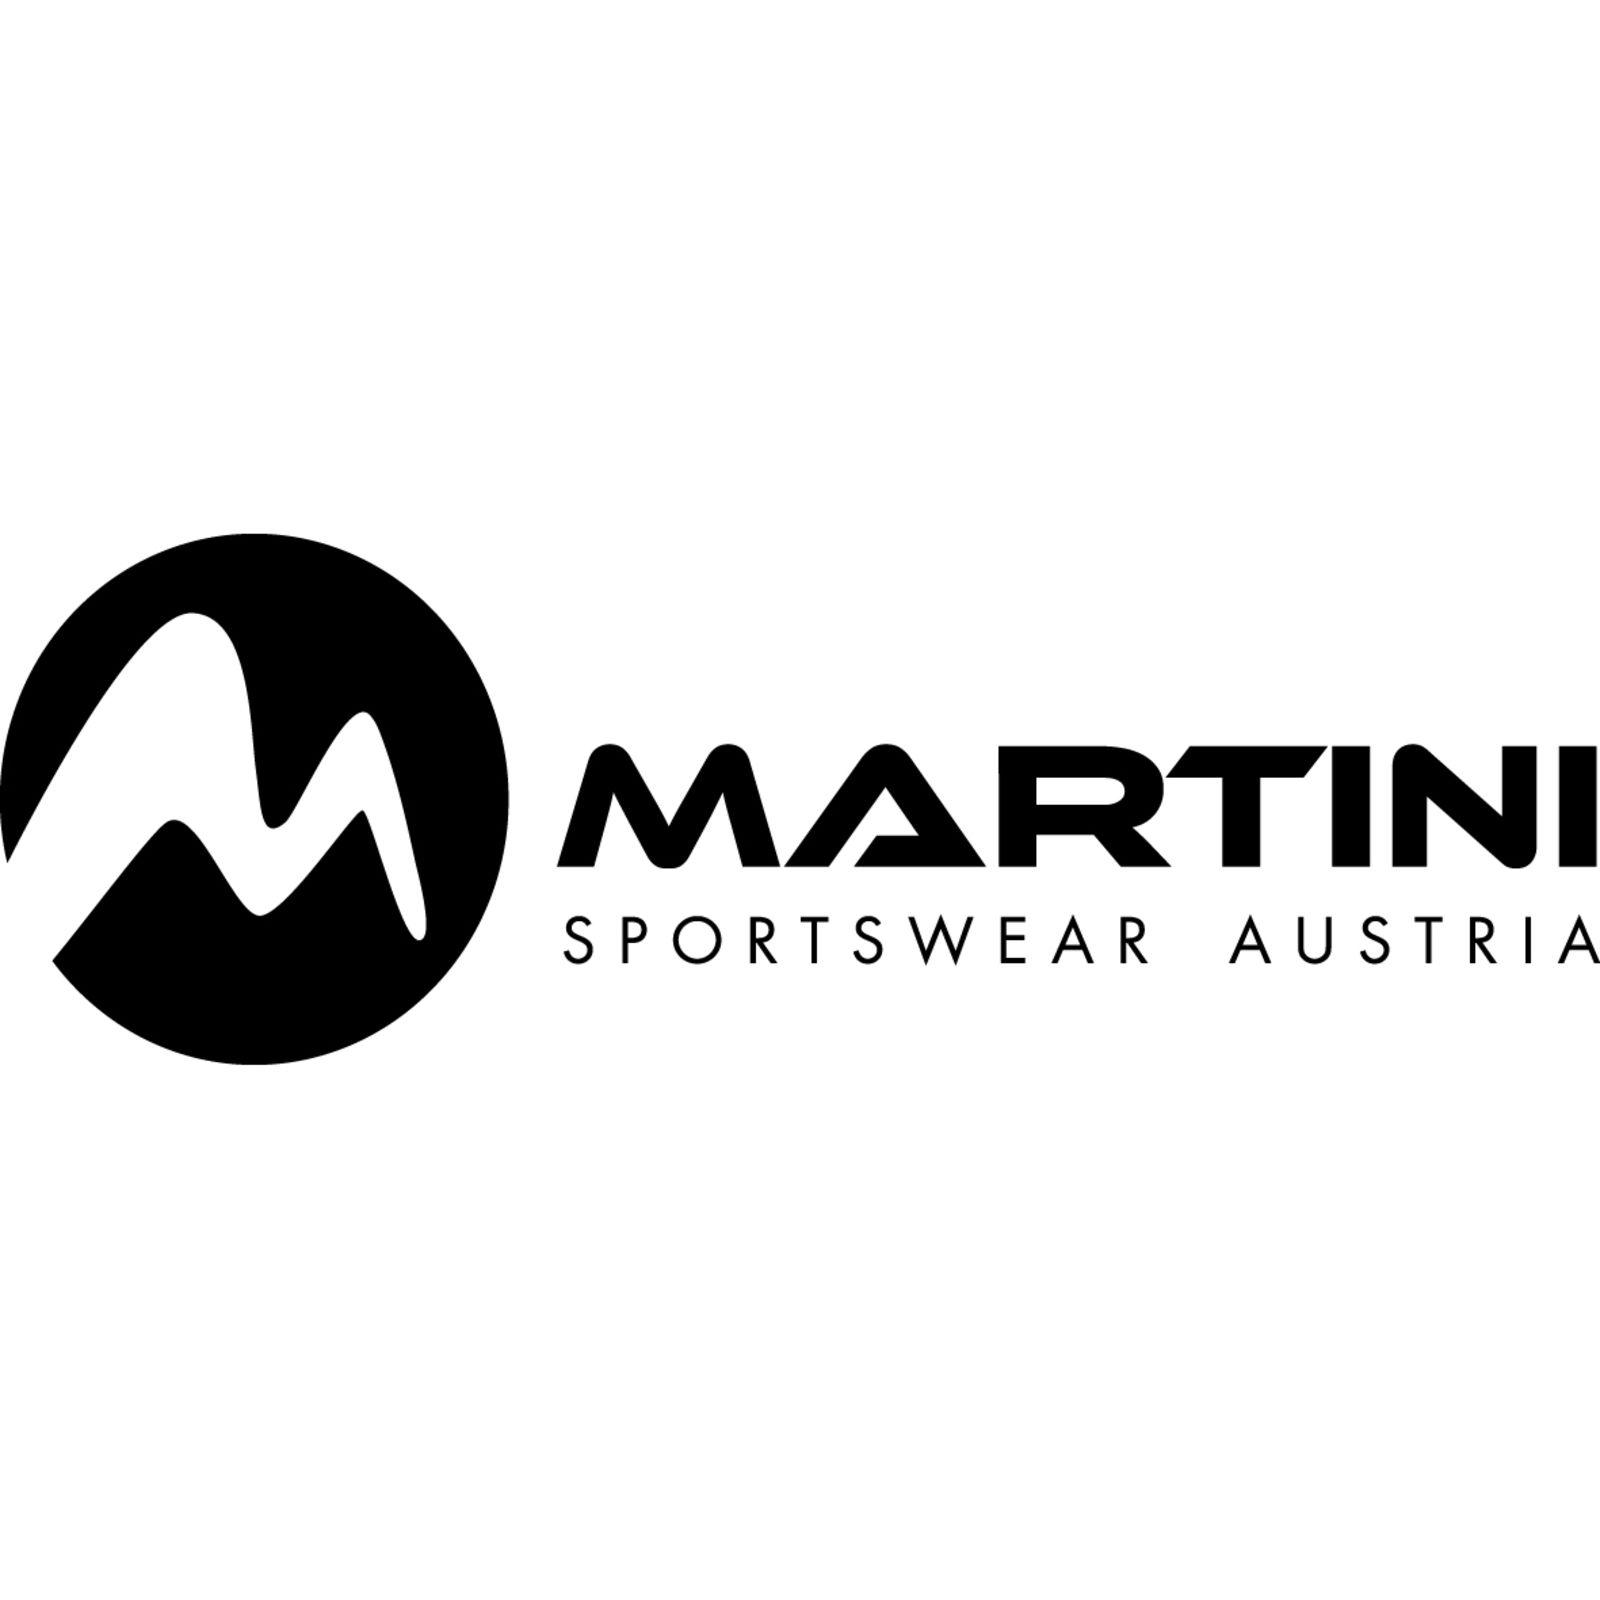 MARTINI SPORTSWEAR AUSTRIA (Bild 1)